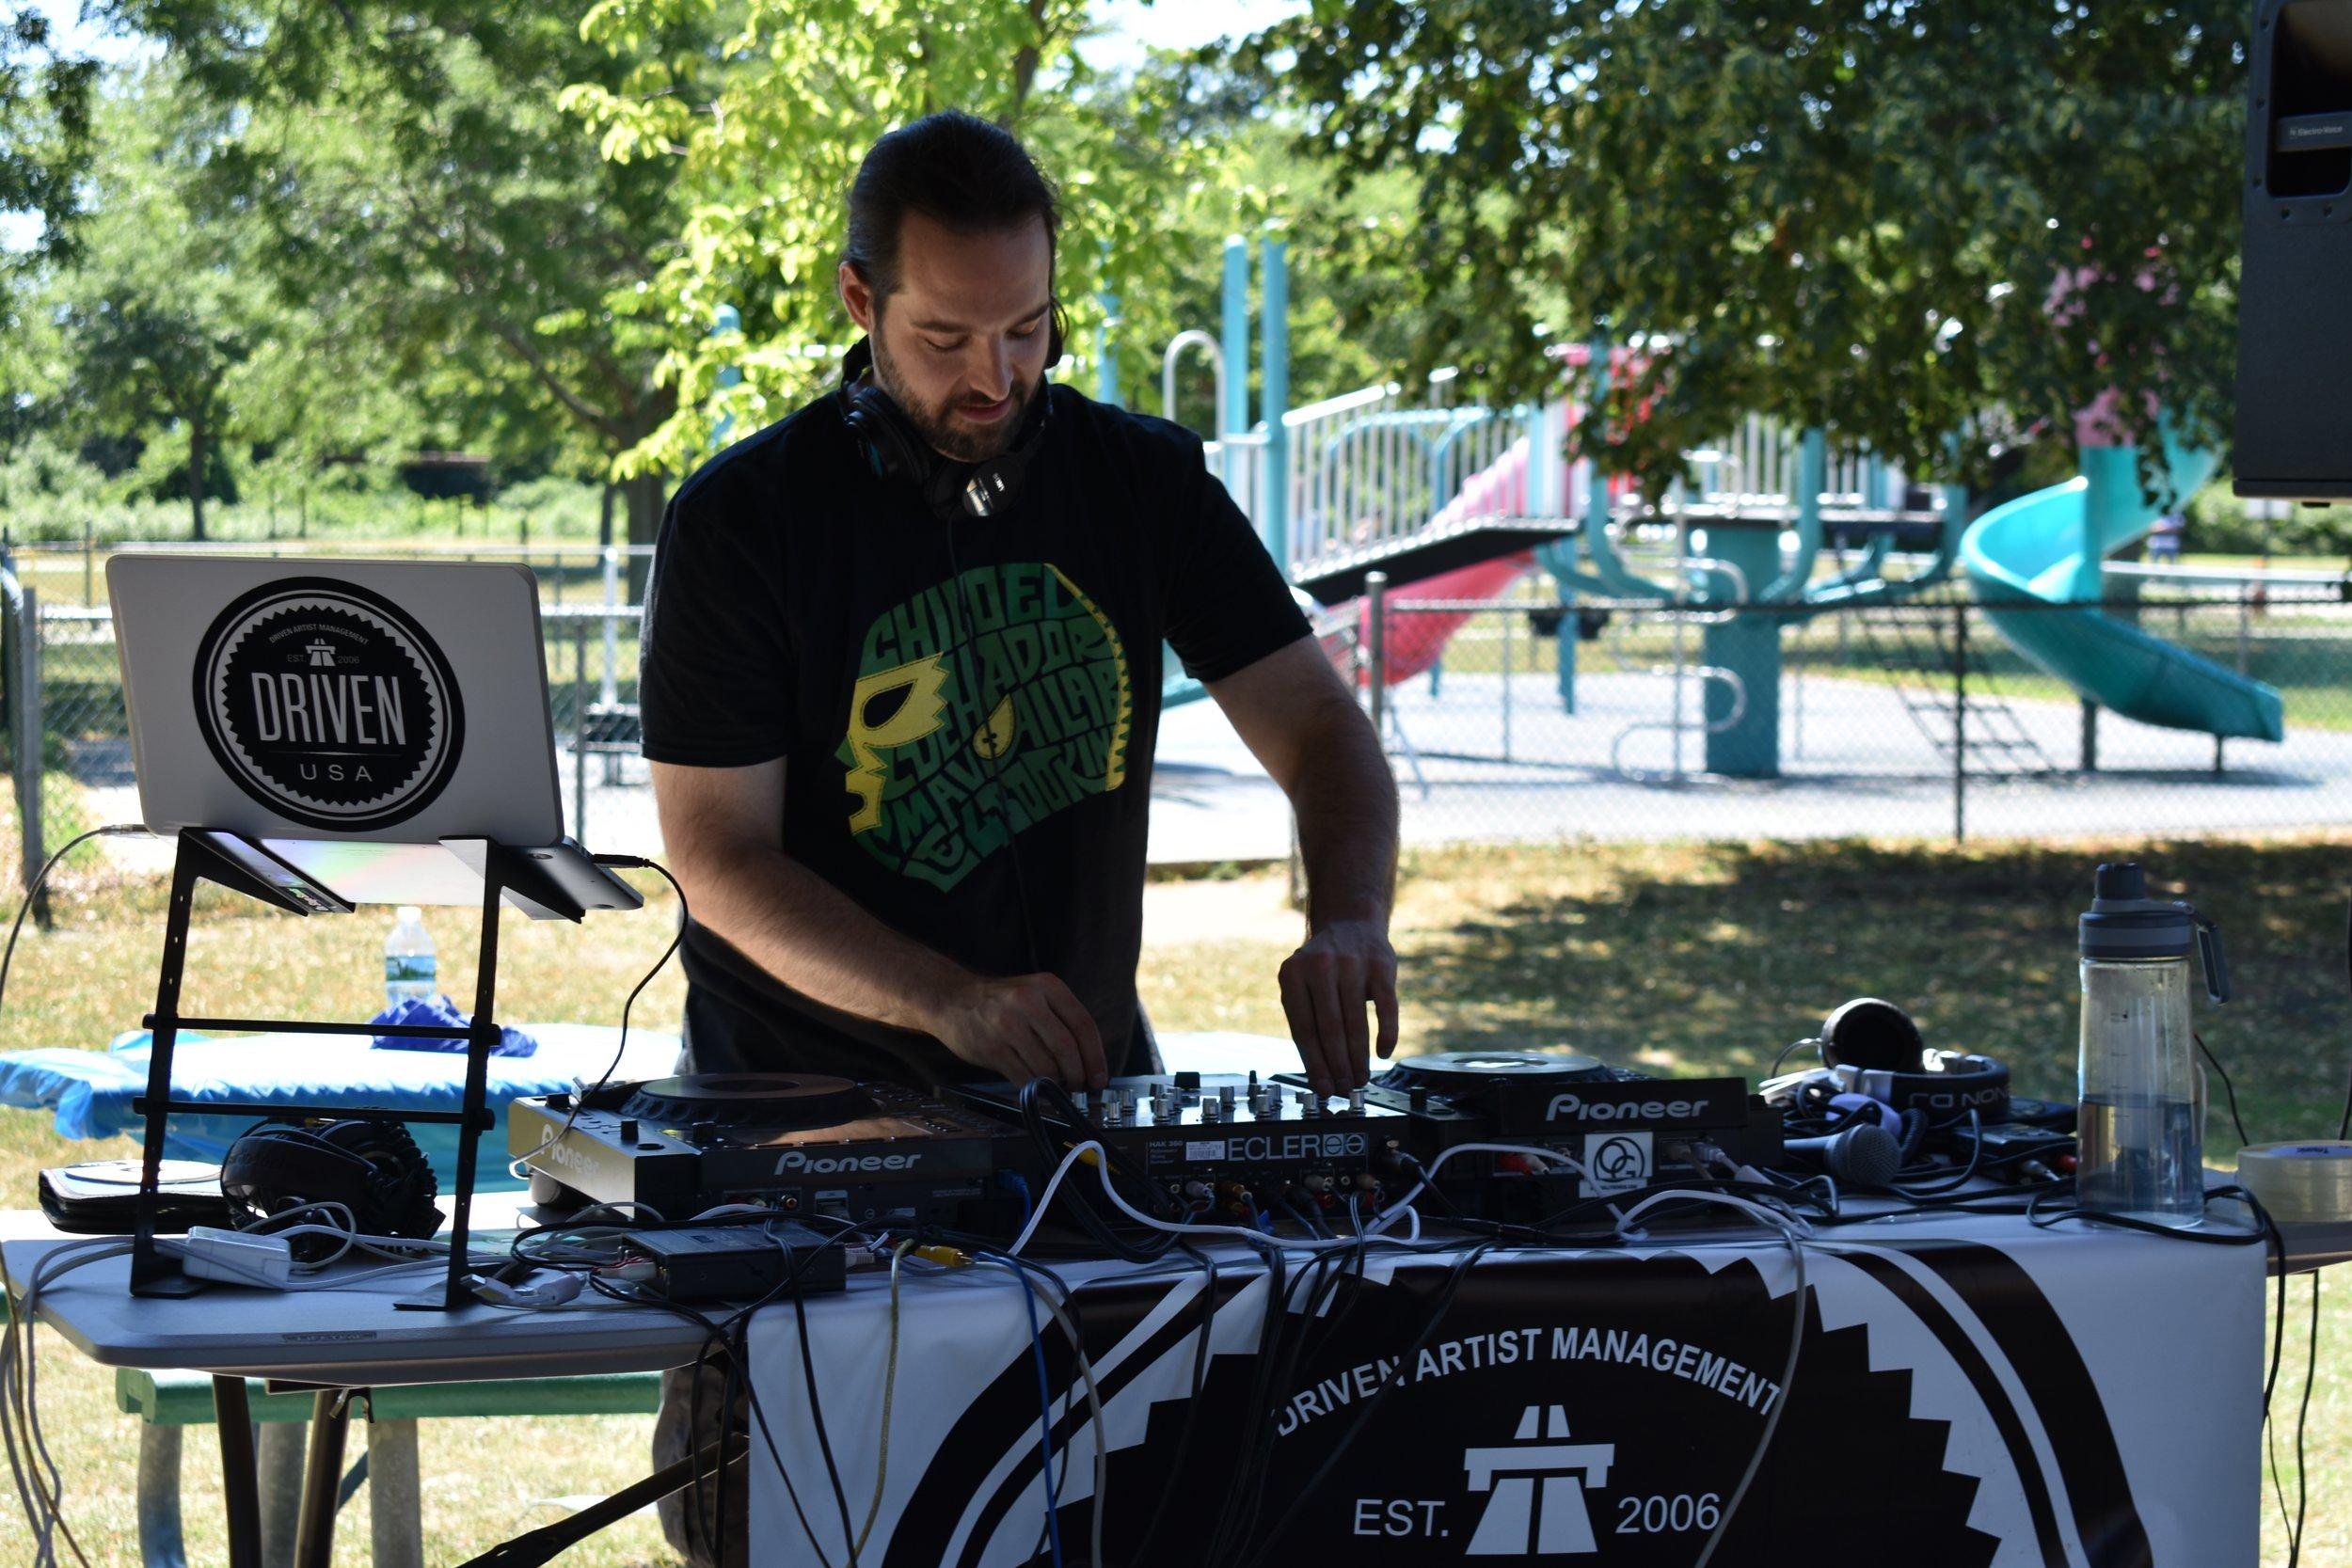 DAVE SHICHMAN @ 14th Annual DnB BBQ - Cedar Creek Park, New York  July 7th, 2018   https://youtu.be/X488dknAZtU